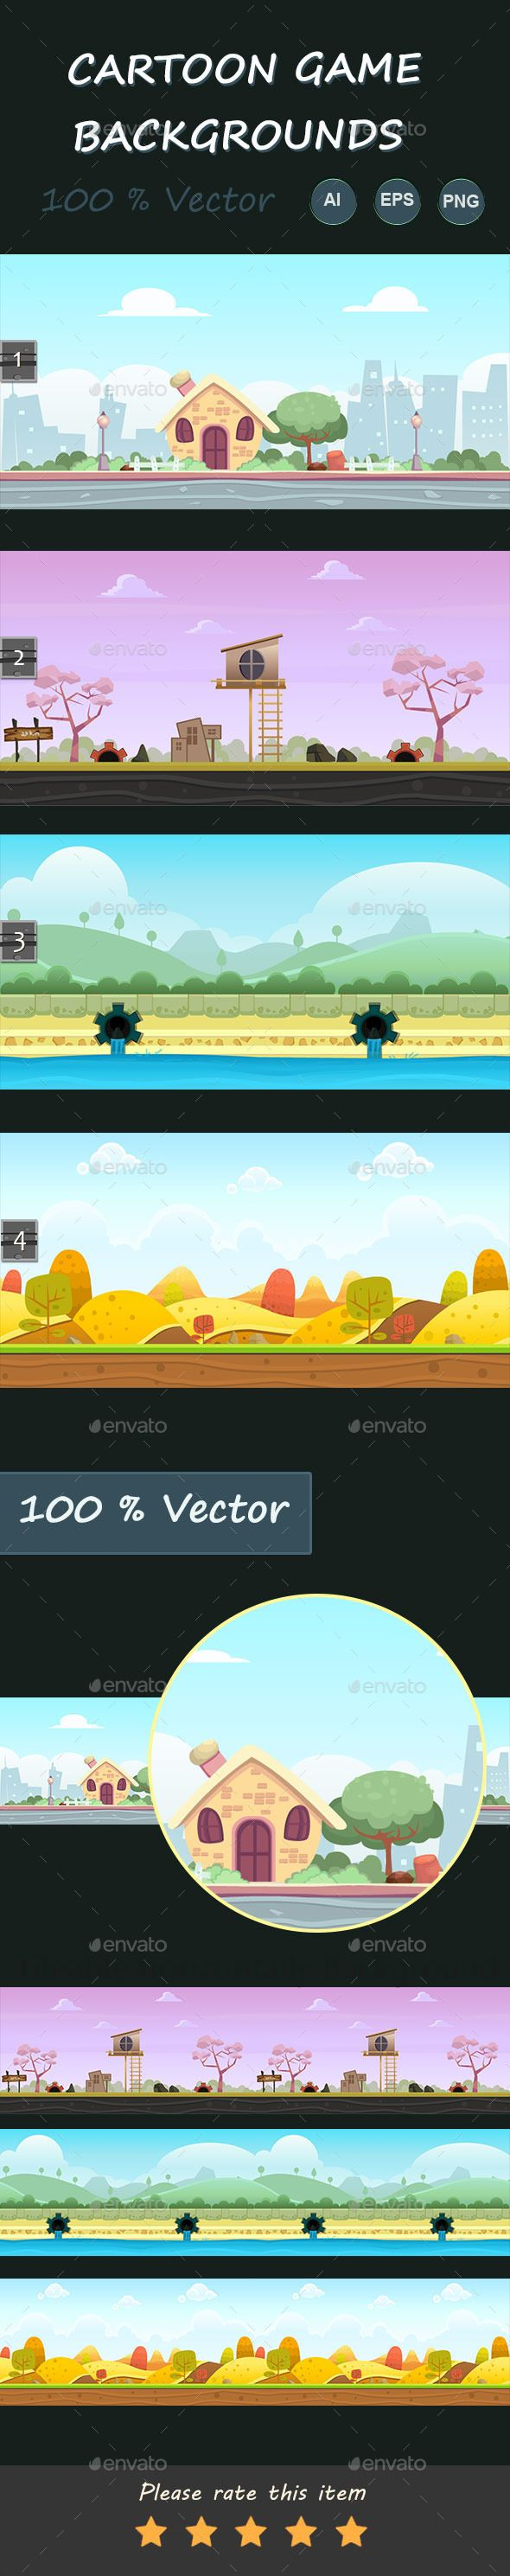 Cartoon Game Backgrounds Download here: https://graphicriver.net/item/cartoon-game-backgrounds/11570032?ref=KlitVogli